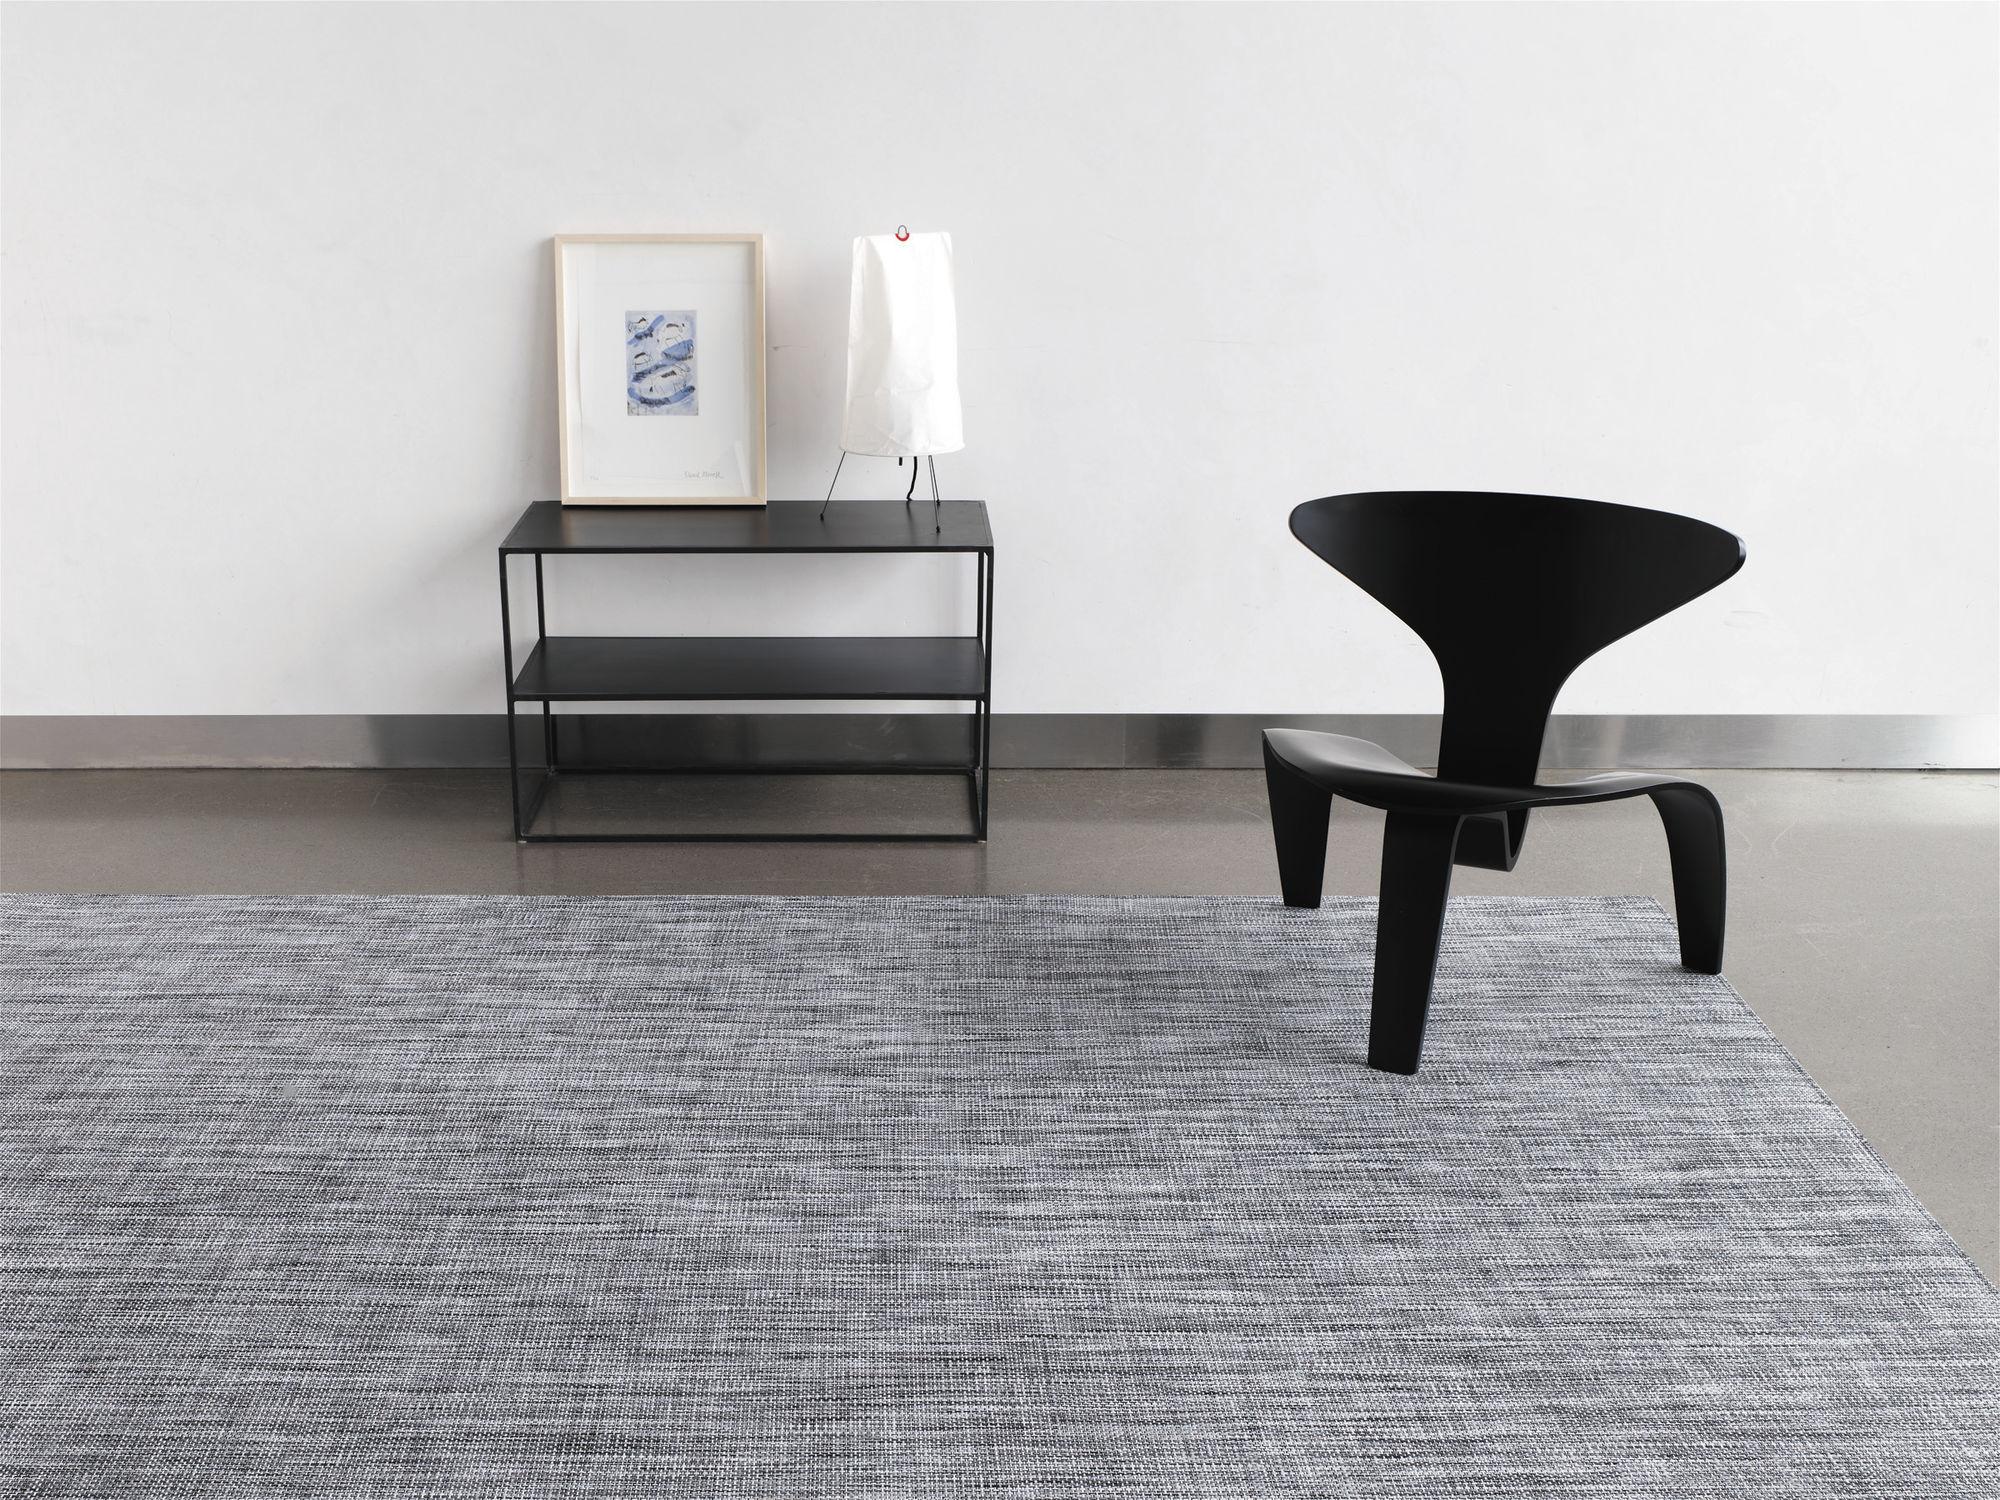 Basket Weave Carpet Good Choice For Good Floor Style